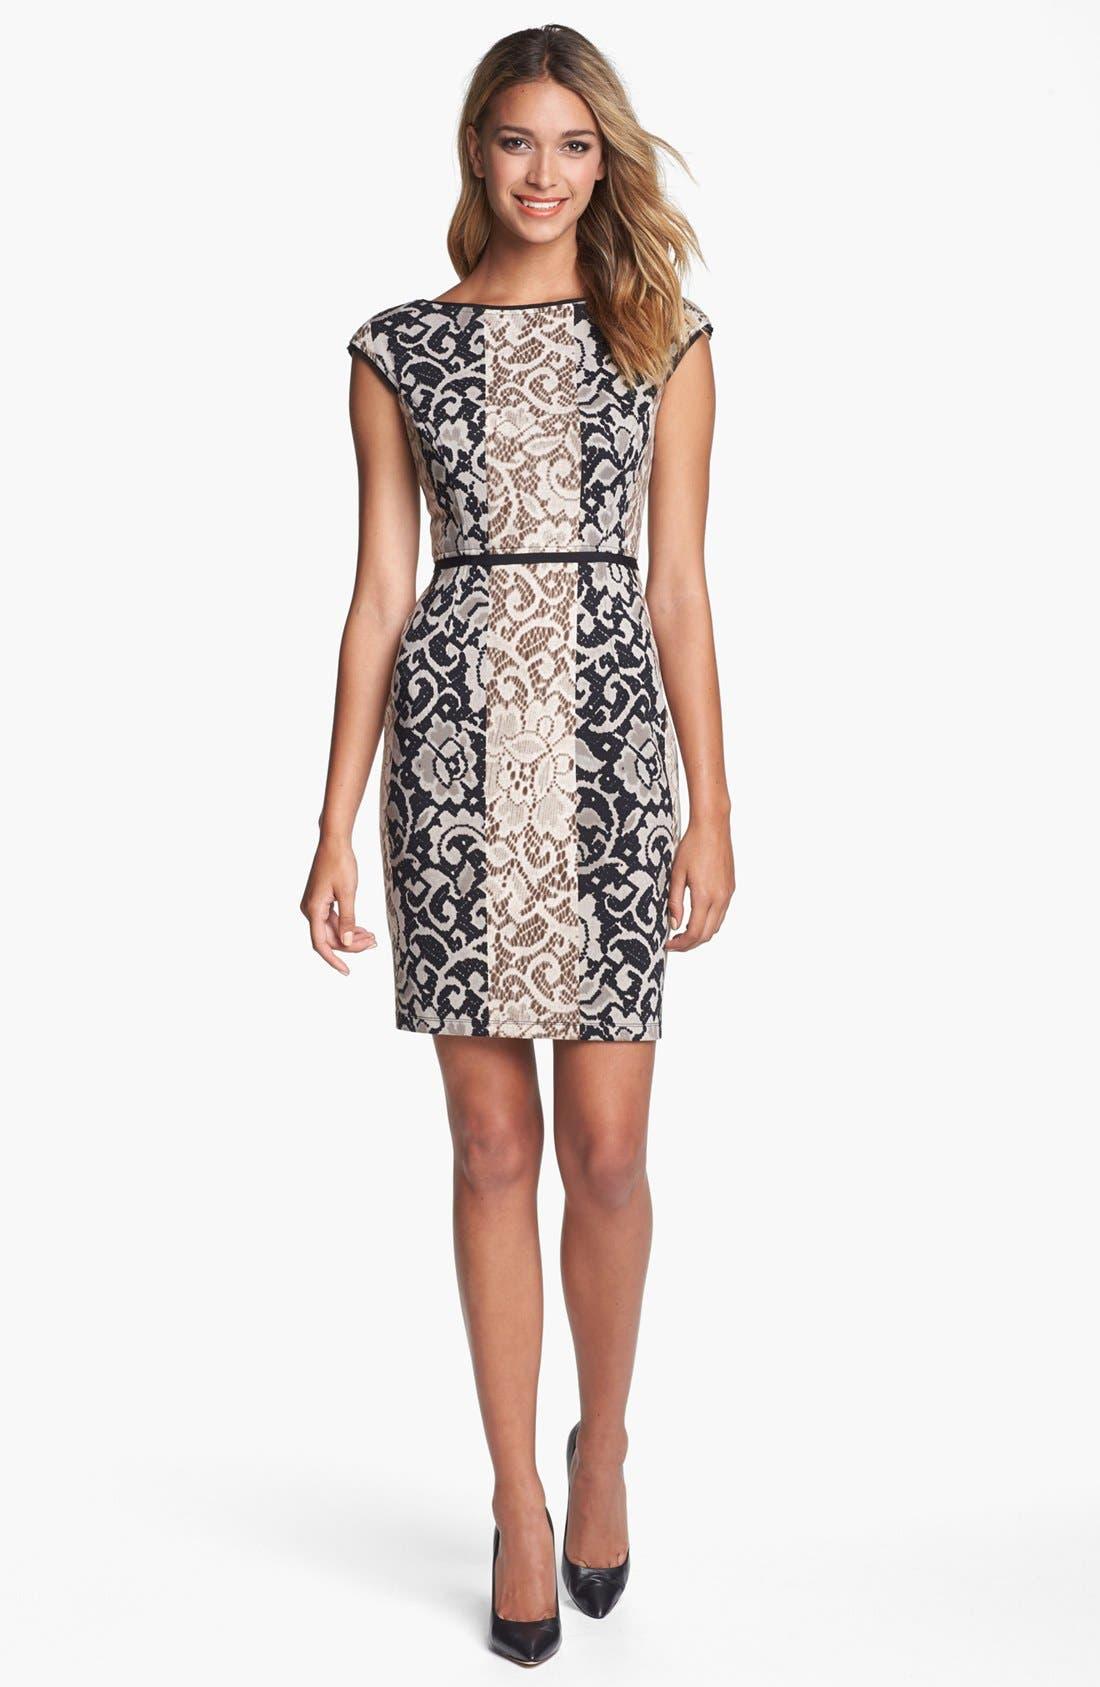 Alternate Image 1 Selected - Maggy London Mixed Print Ponte Knit Sheath Dress